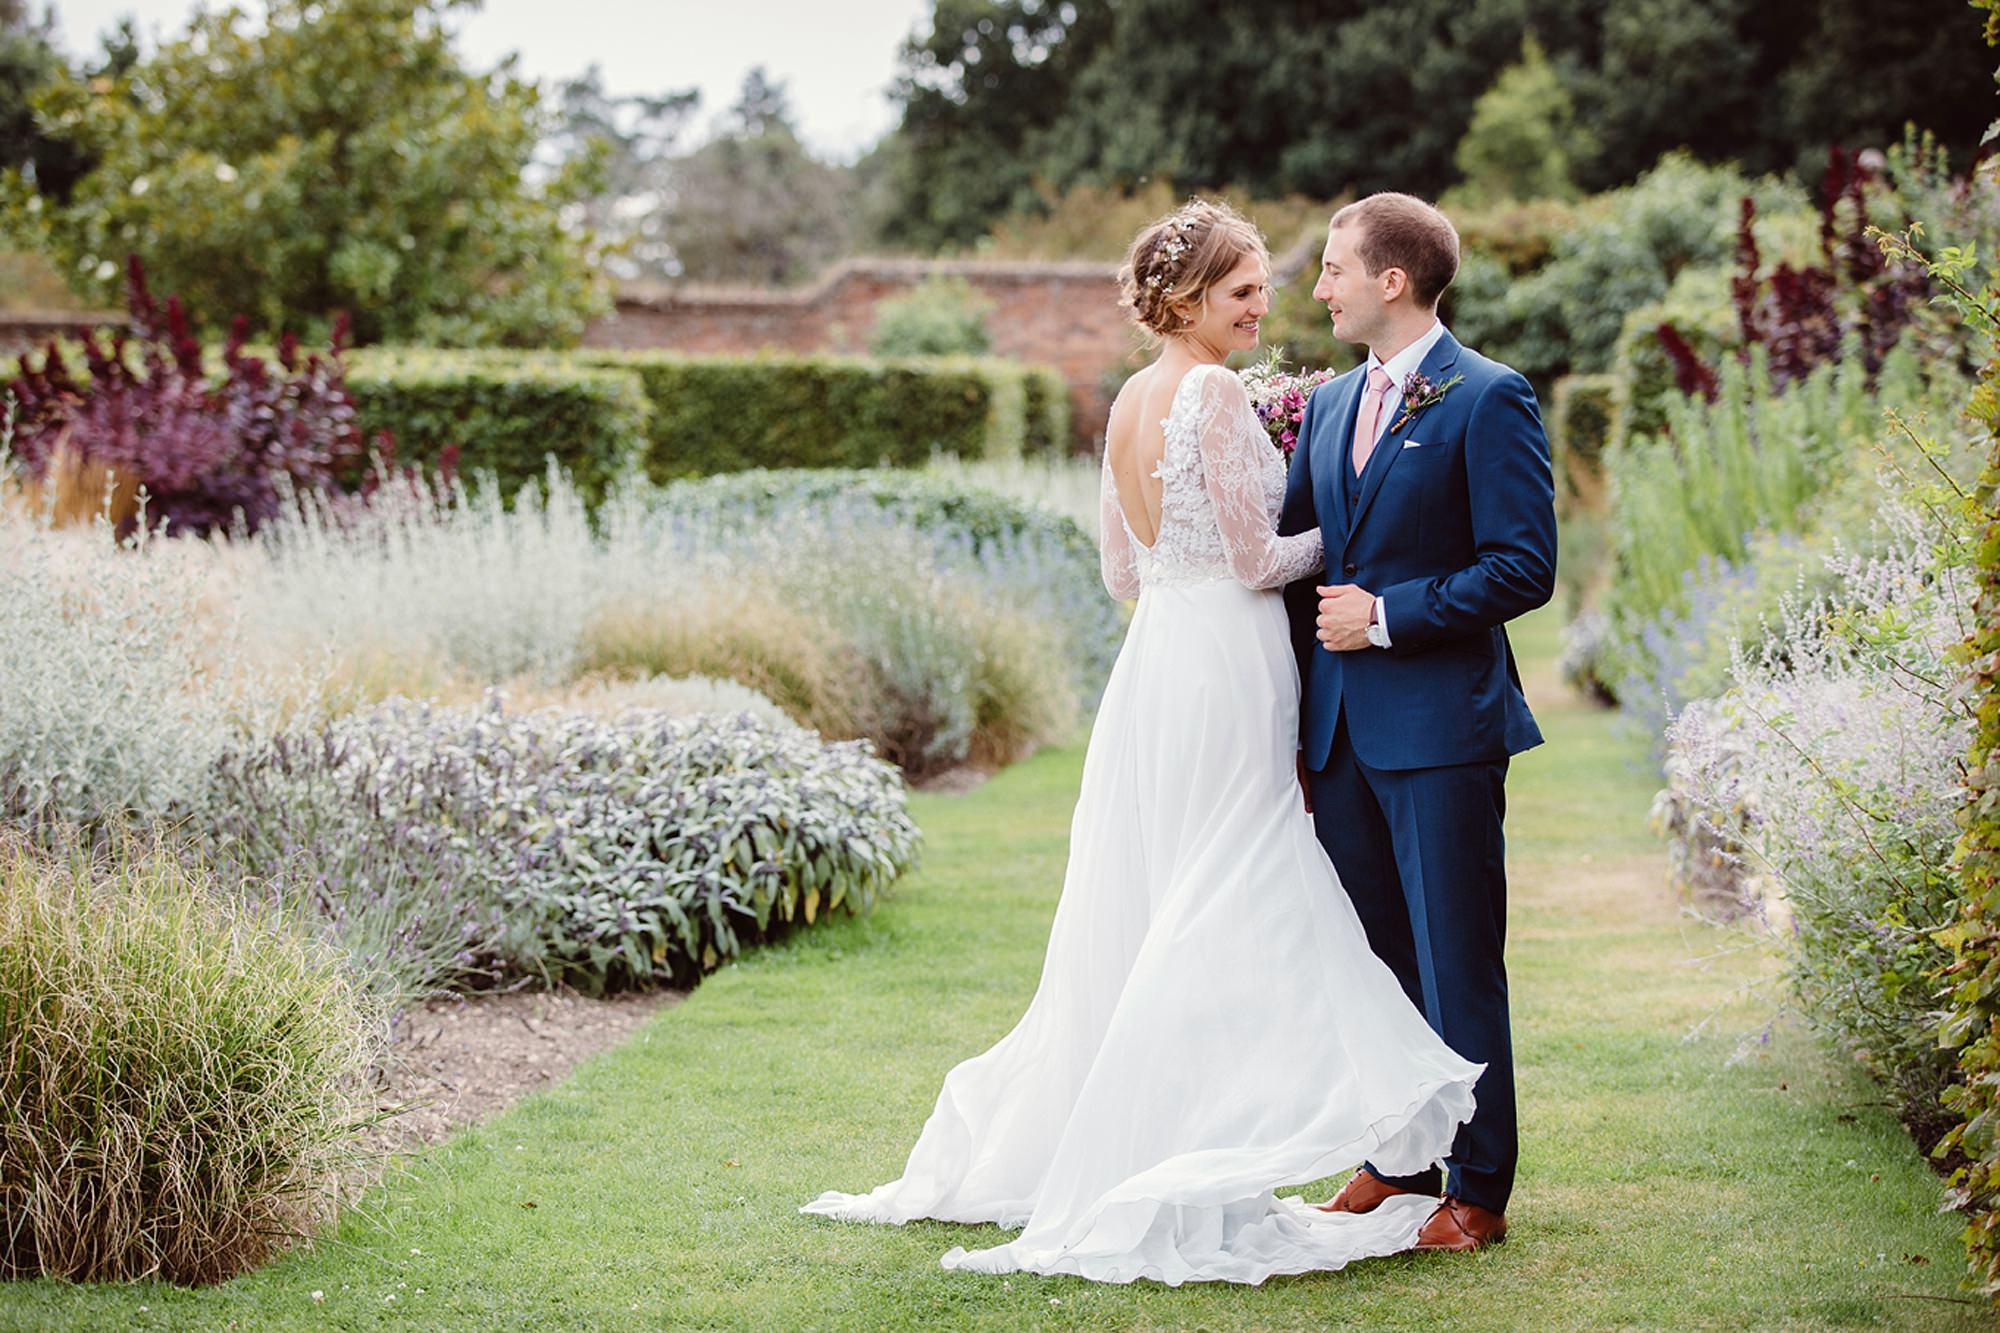 Marks Hall Estate wedding photography bride and groom together